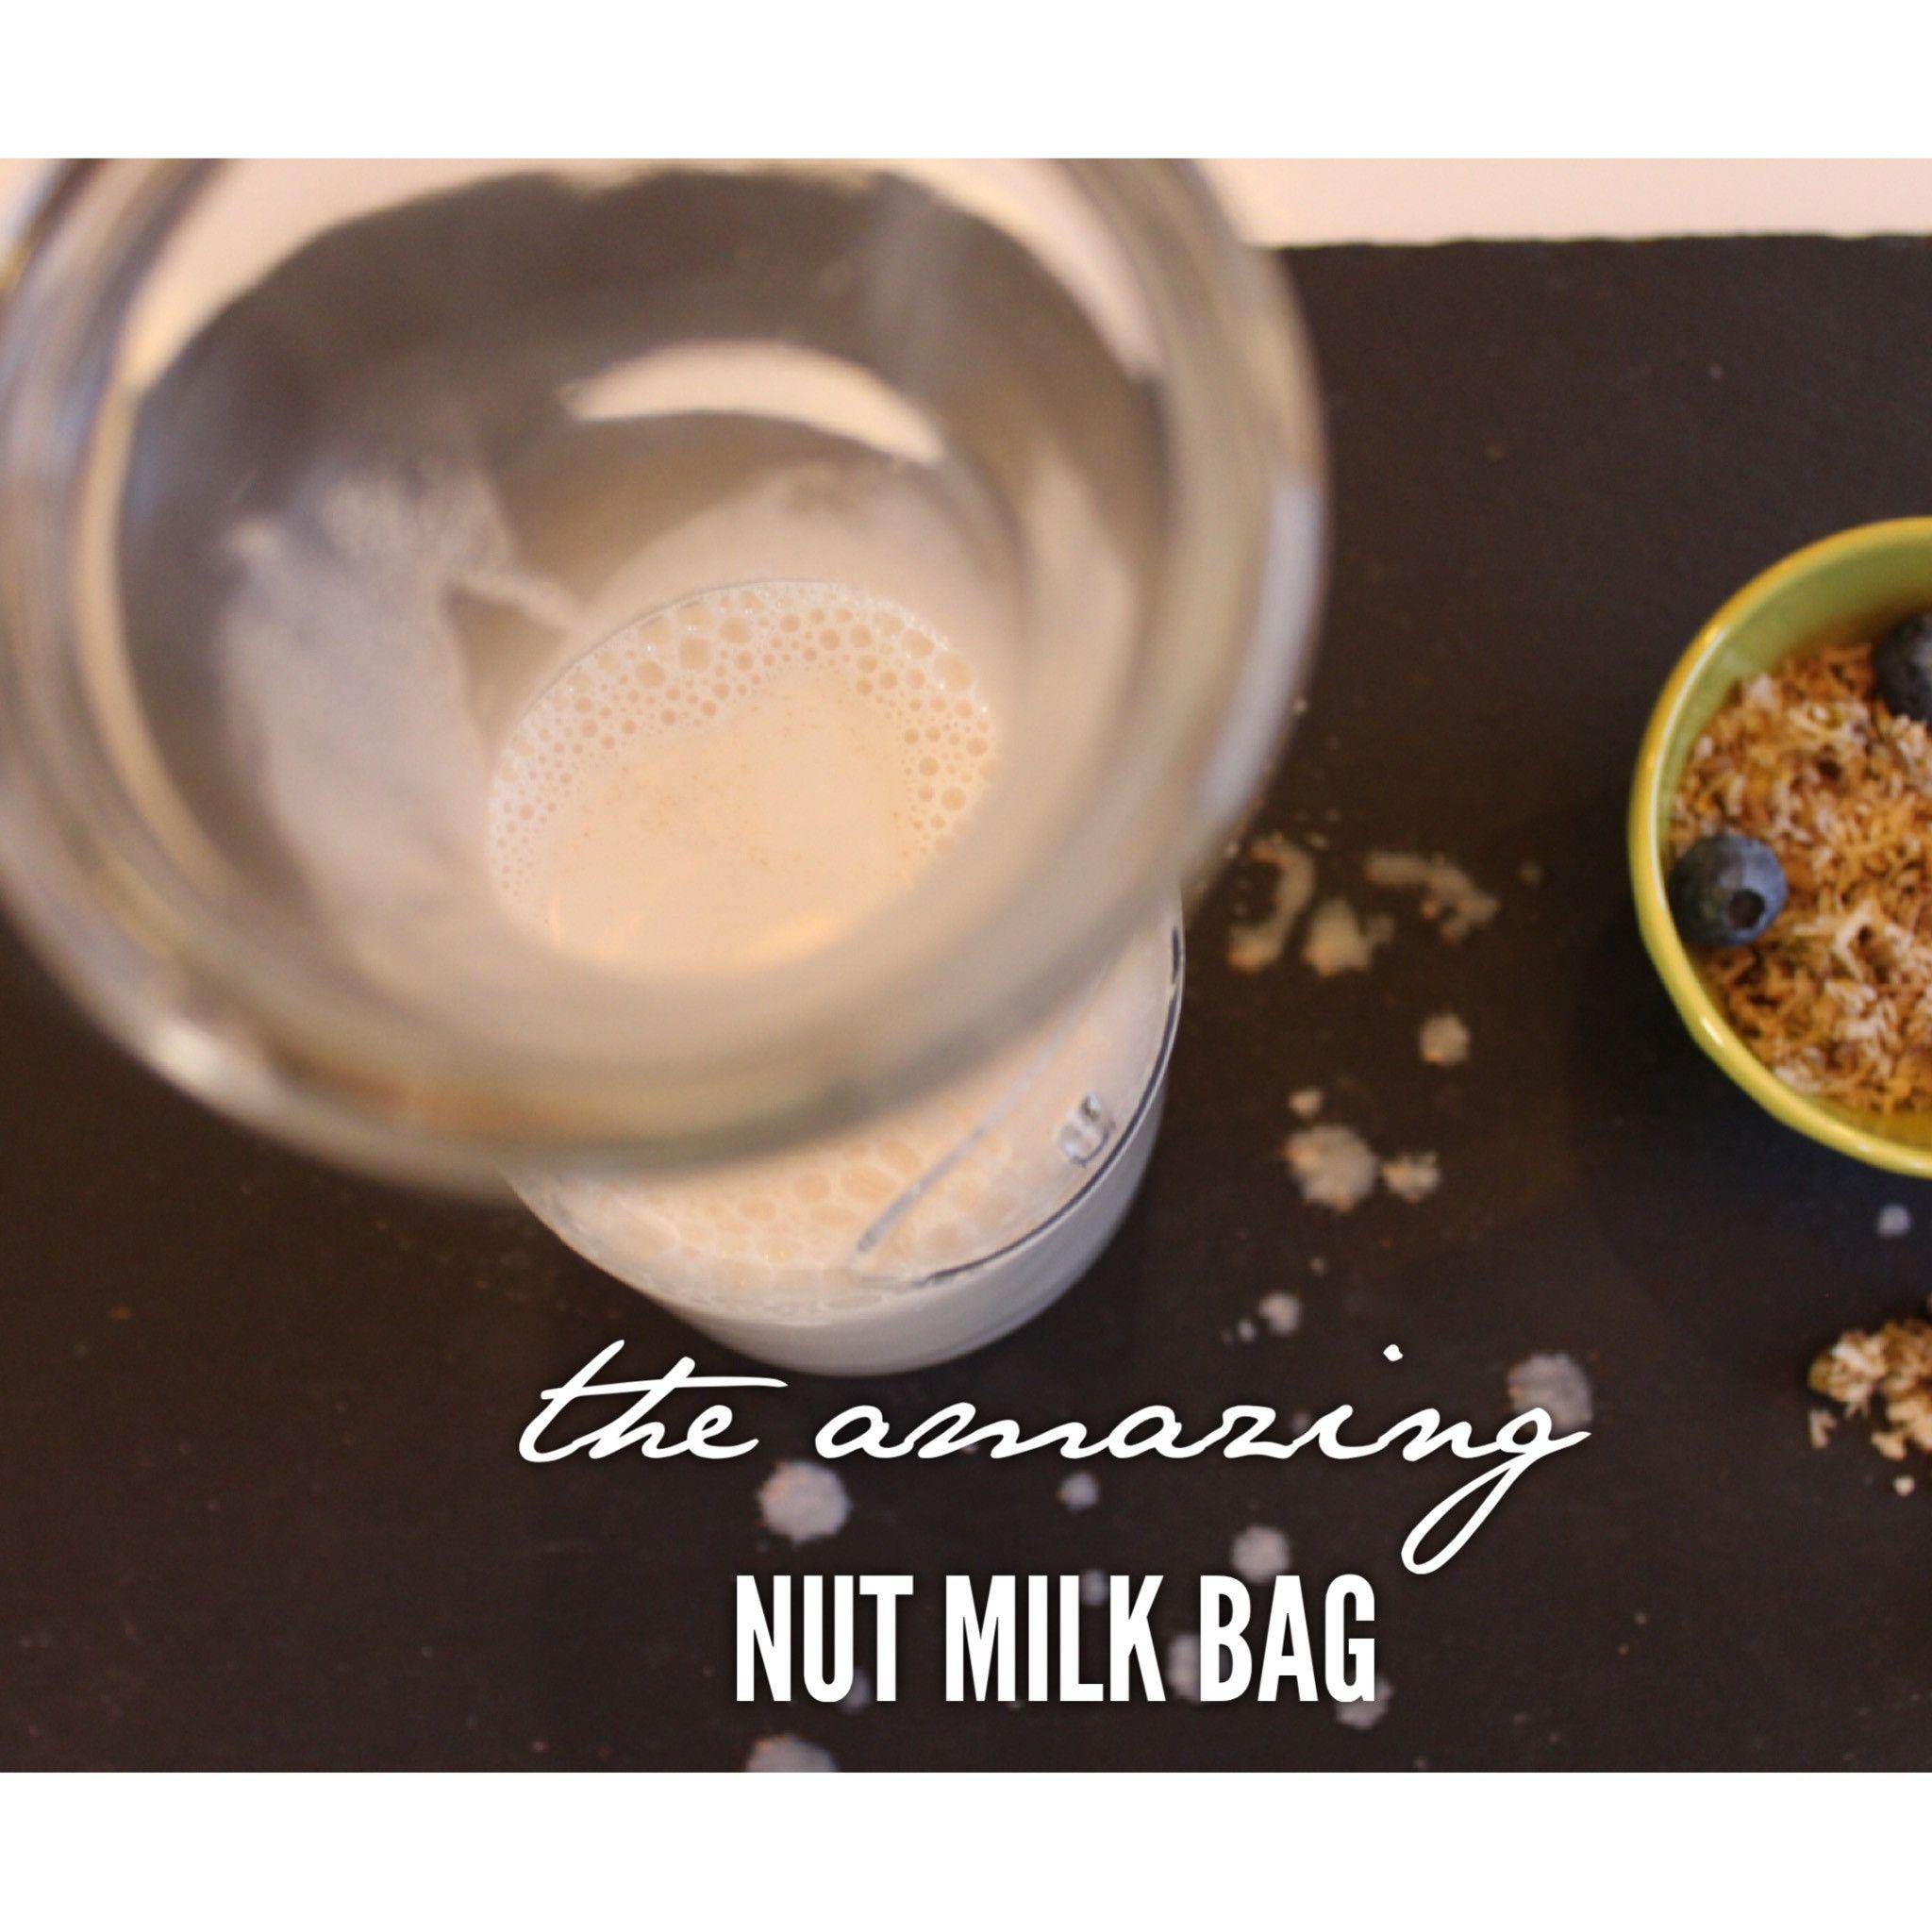 The Amazing Nut Milk Bag Nut milk bag, Bagged milk, Nut